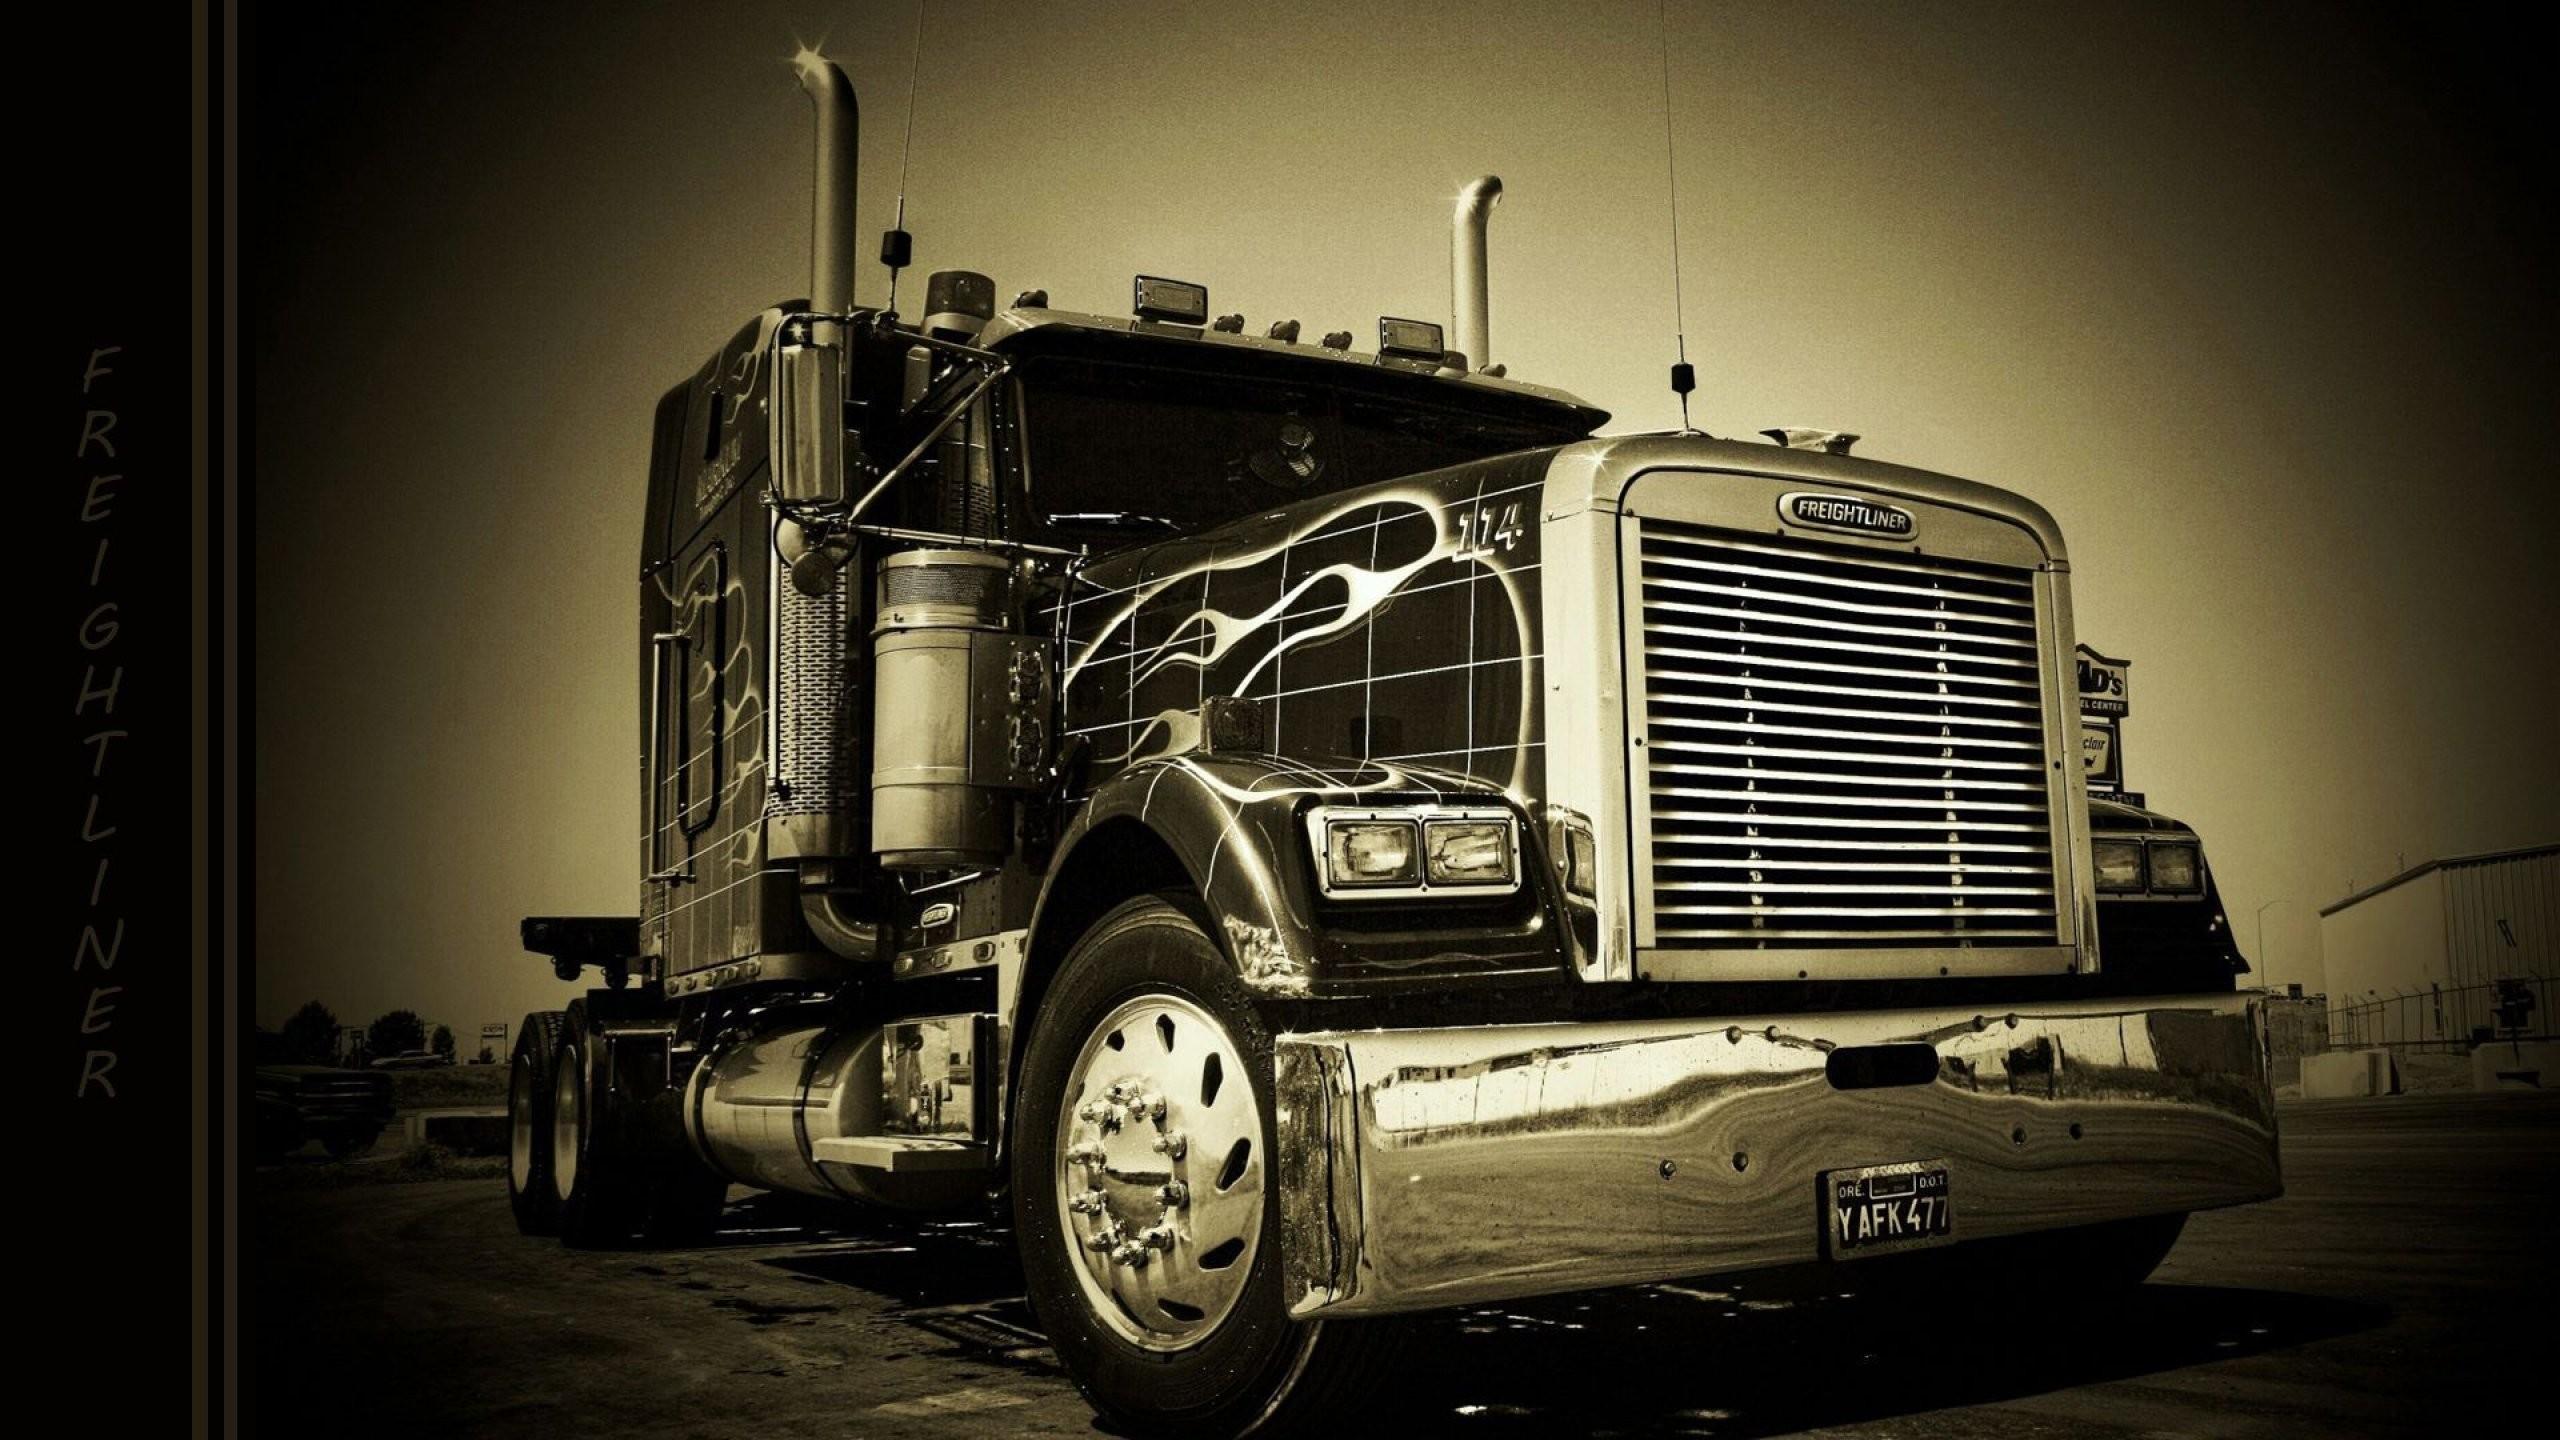 FREIGHTLINER semi tractor transport truck wallpaper | | 795832 |  WallpaperUP